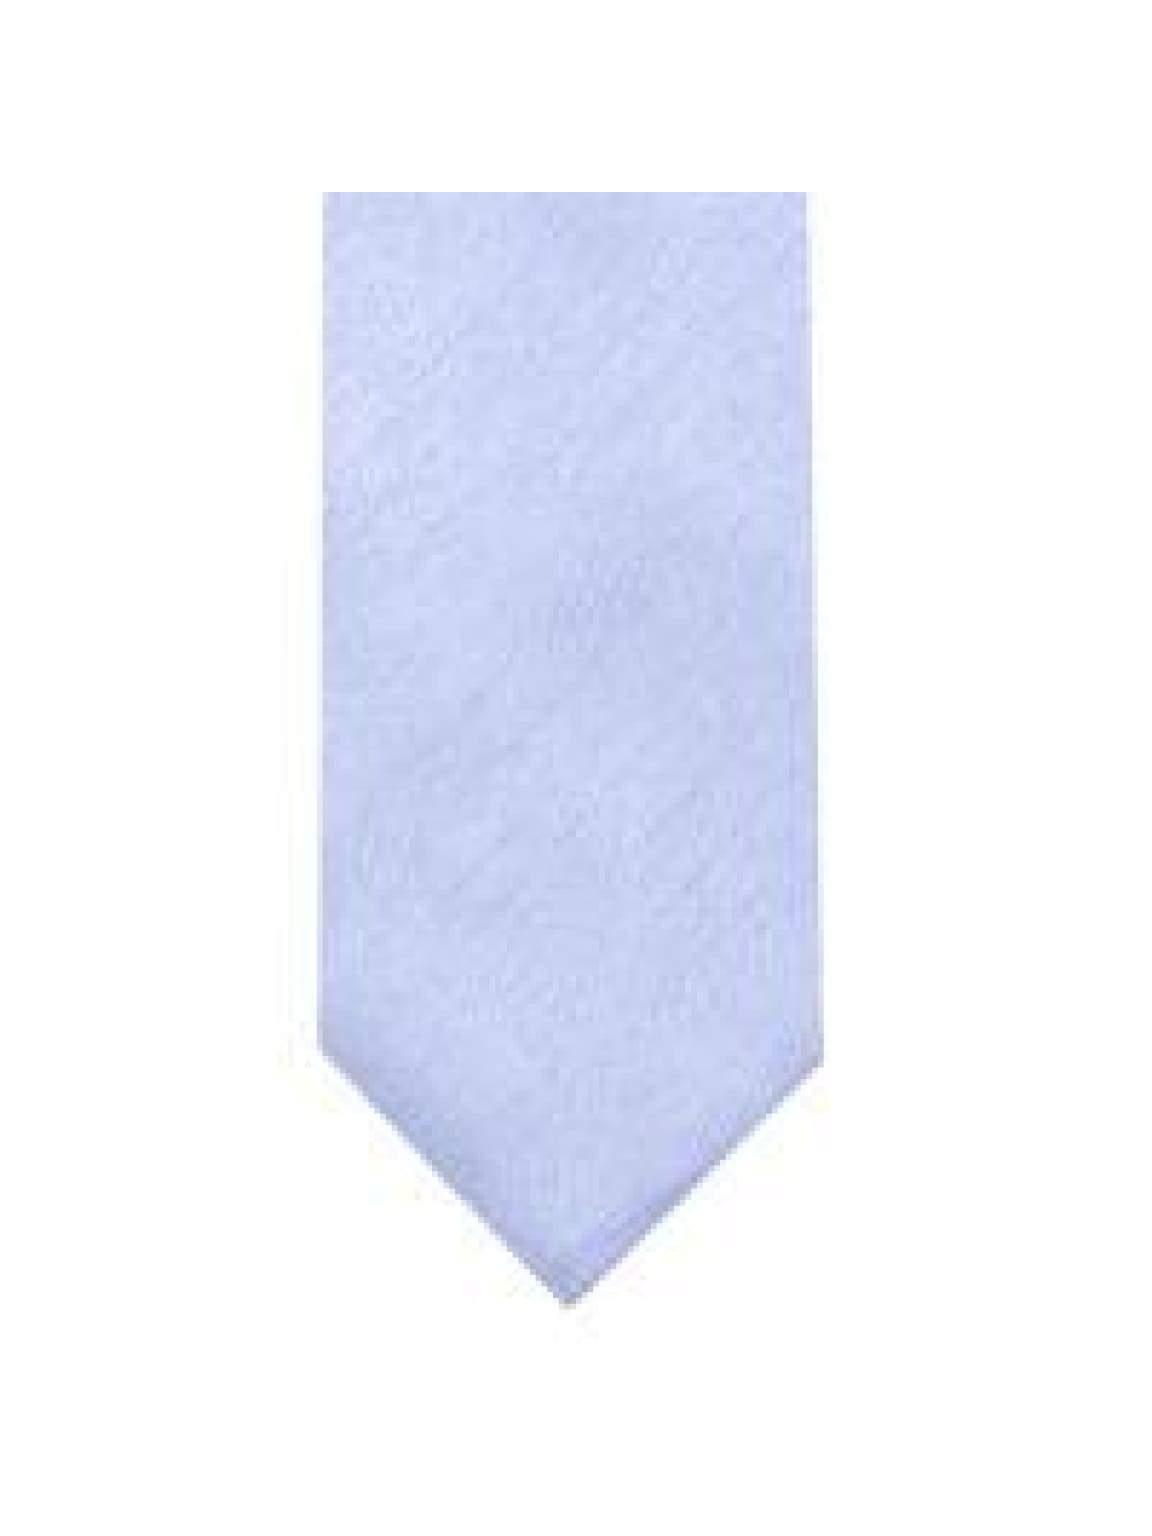 LA Smith Sky Blue Skinny Shantung Tie - Accessories